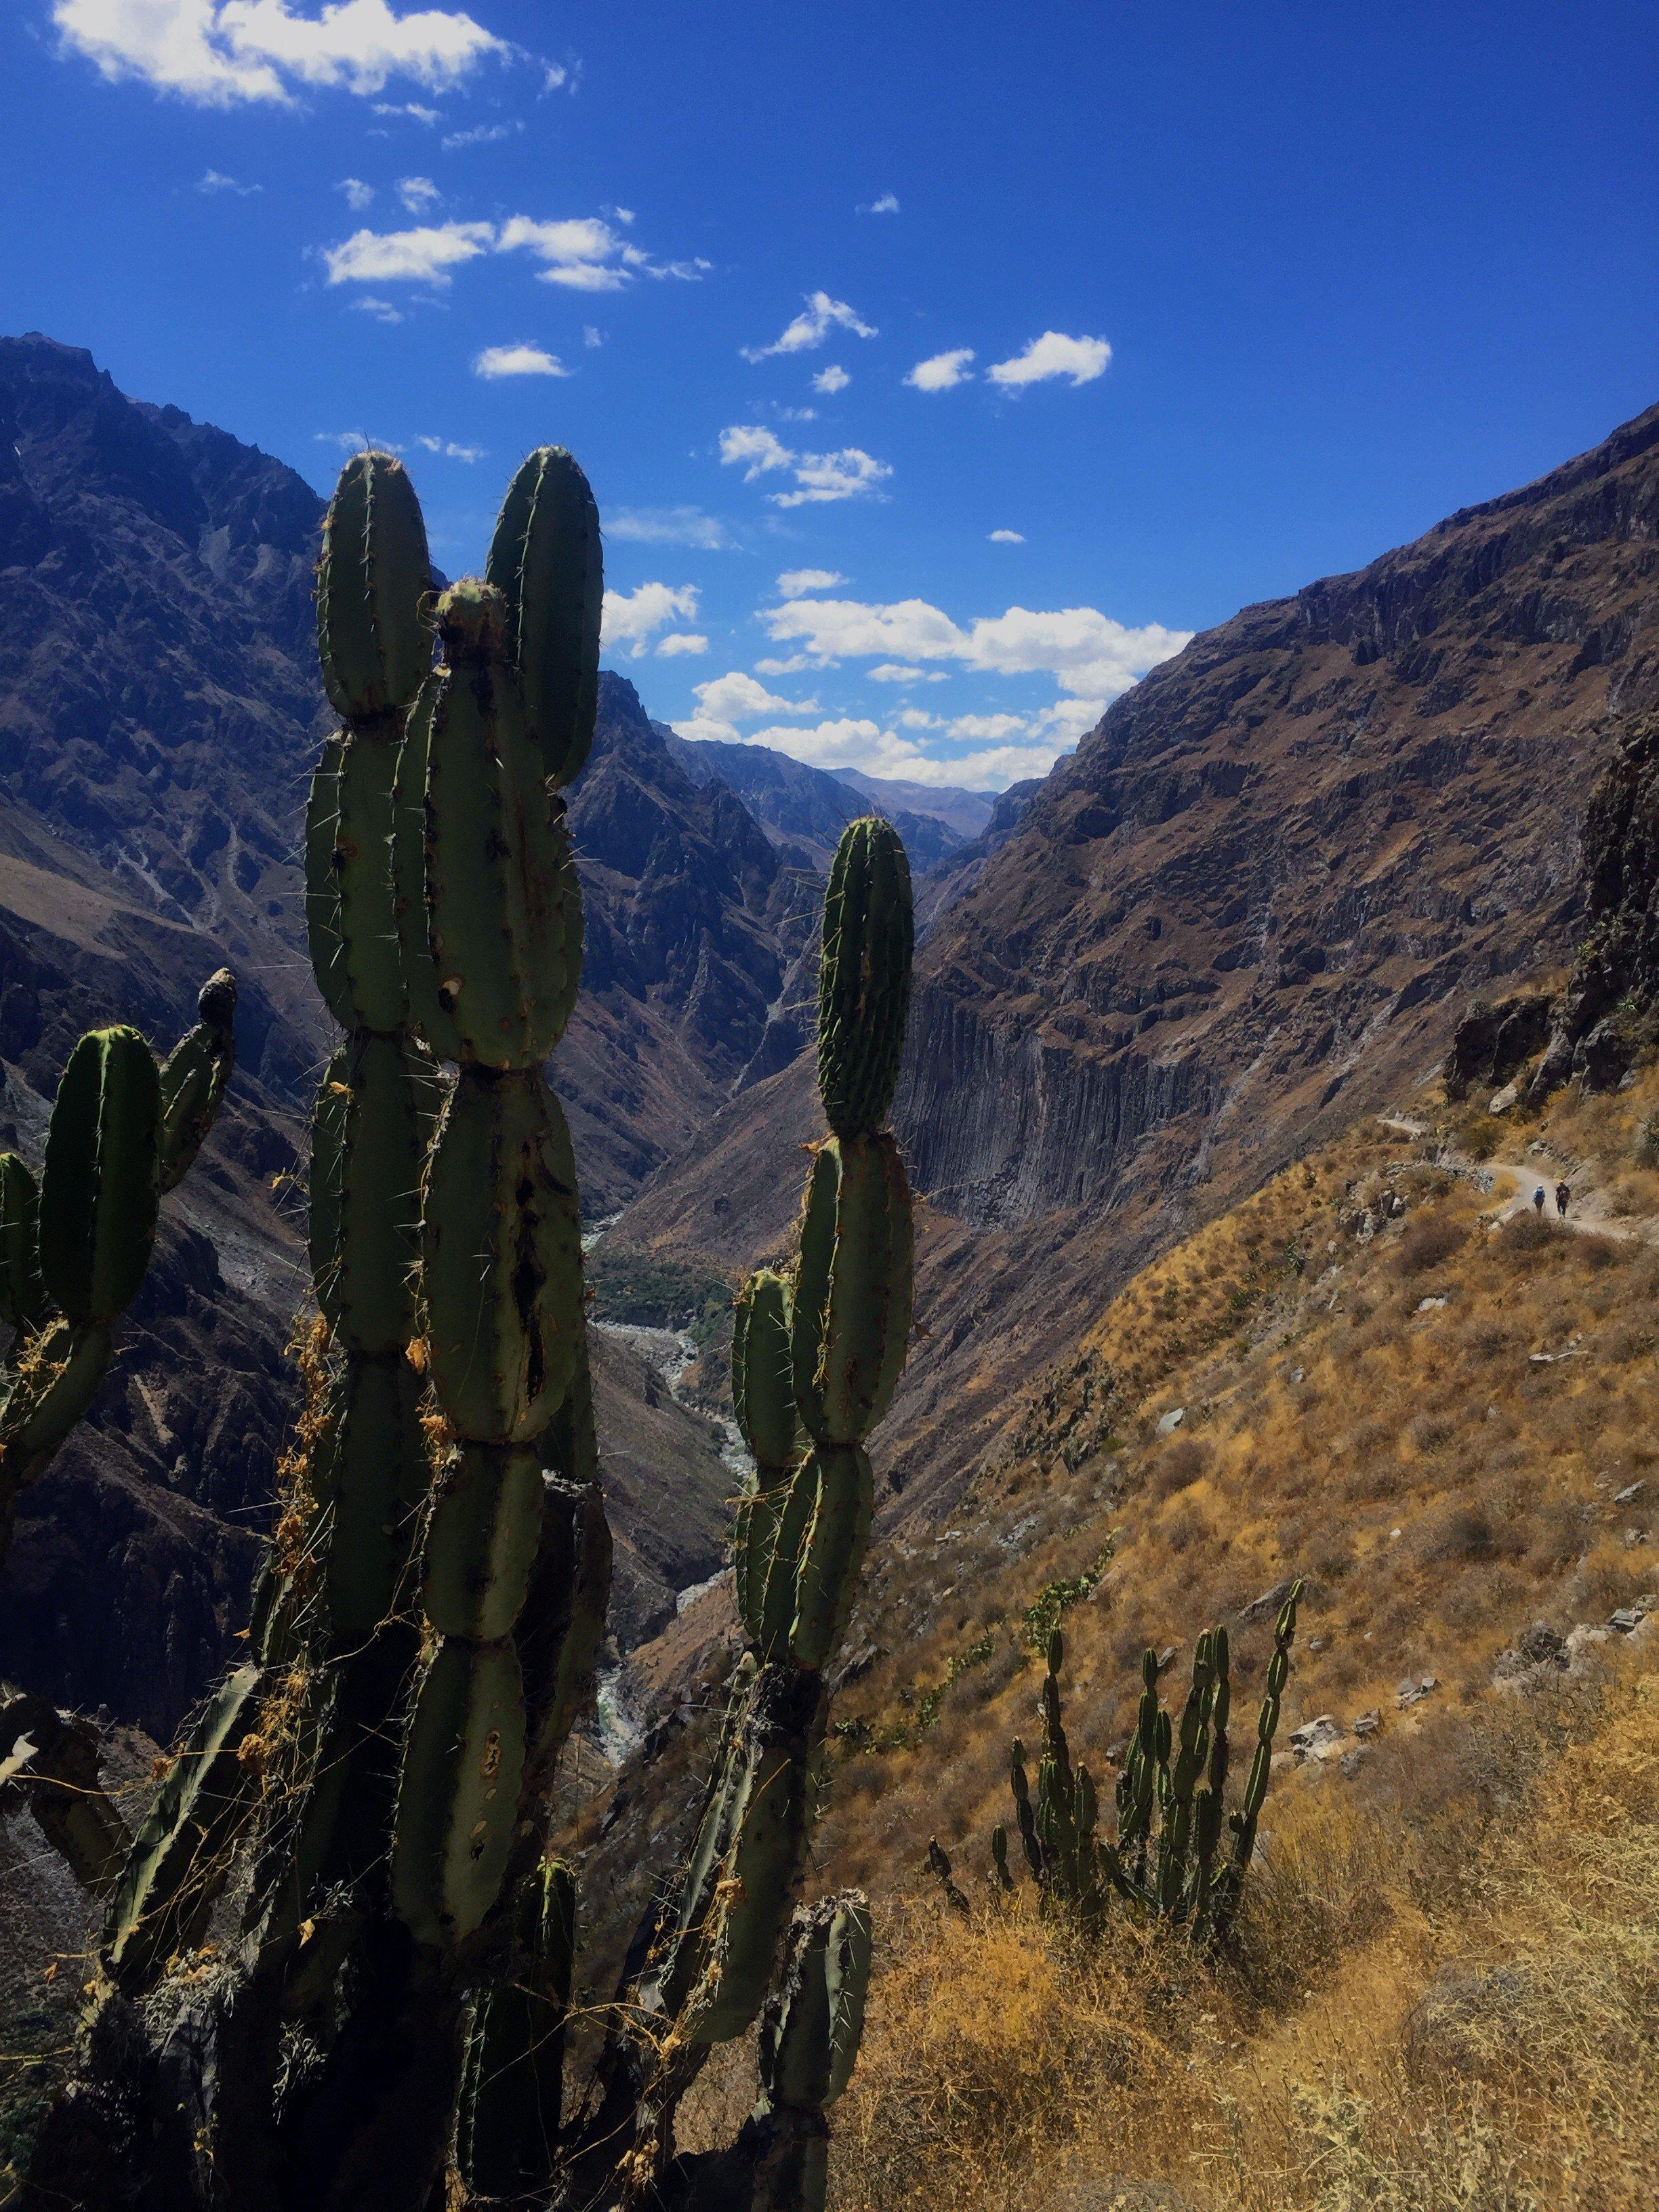 hiking in Colca Canyon in Peru